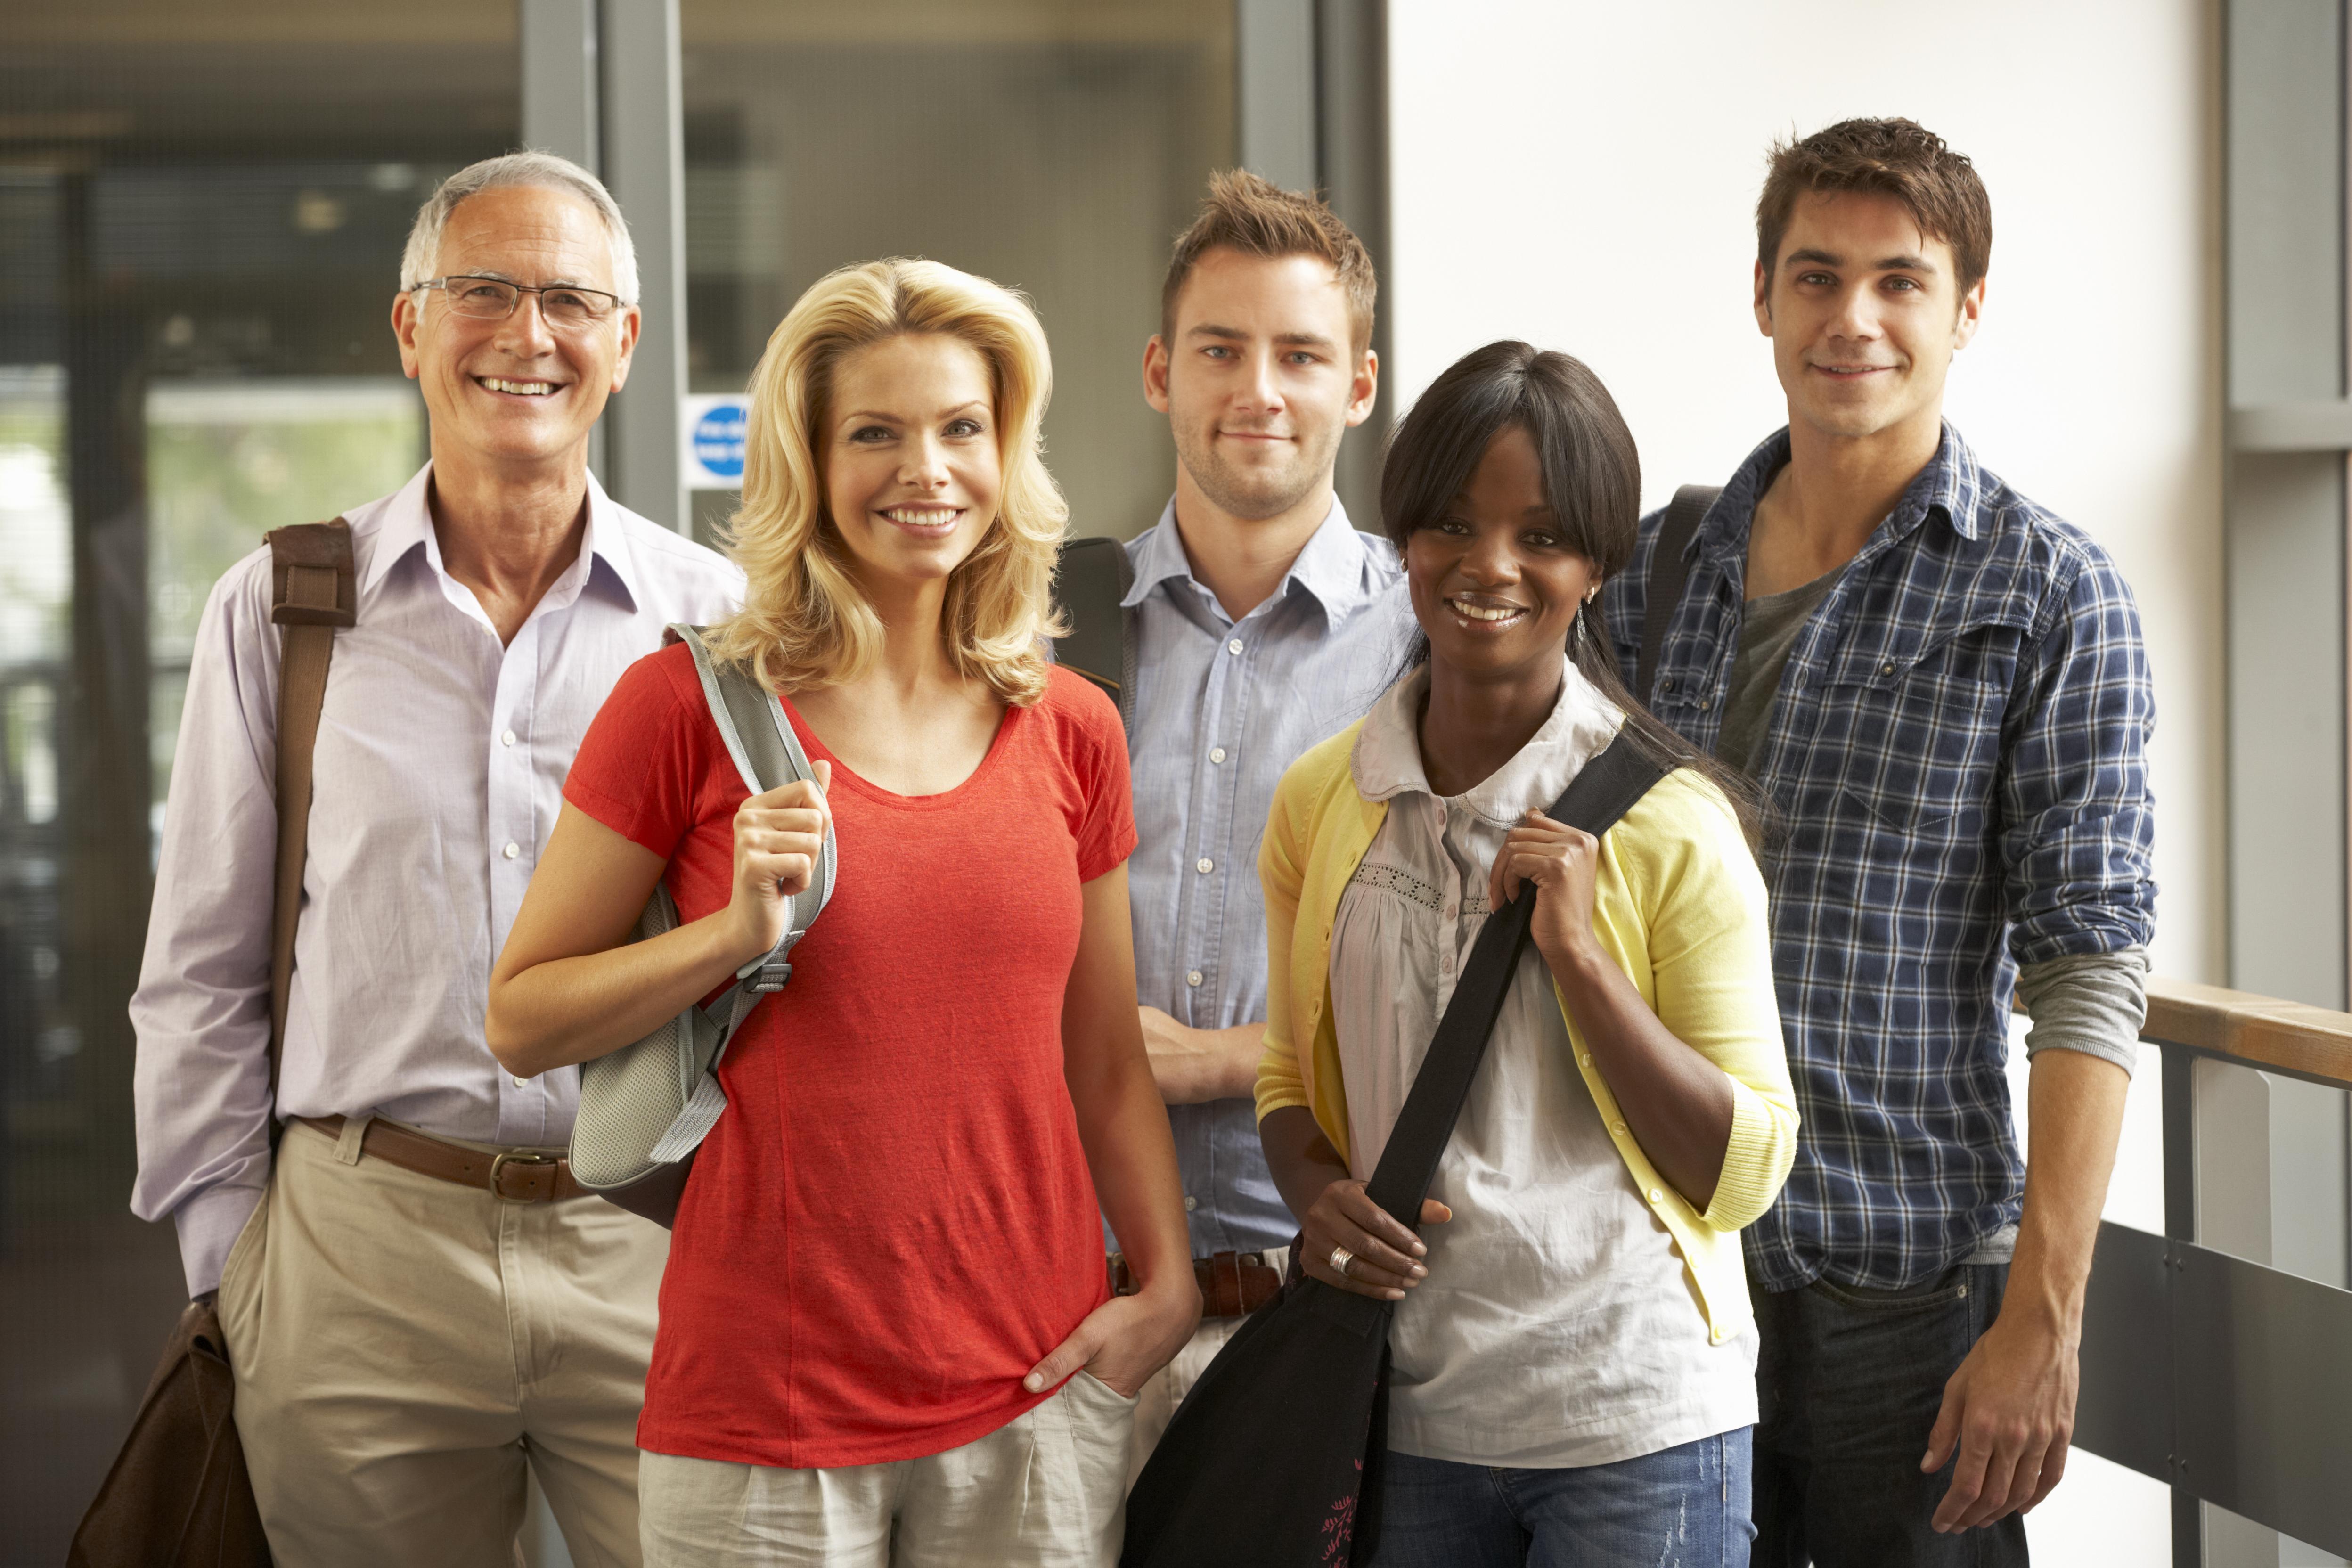 older students attending college